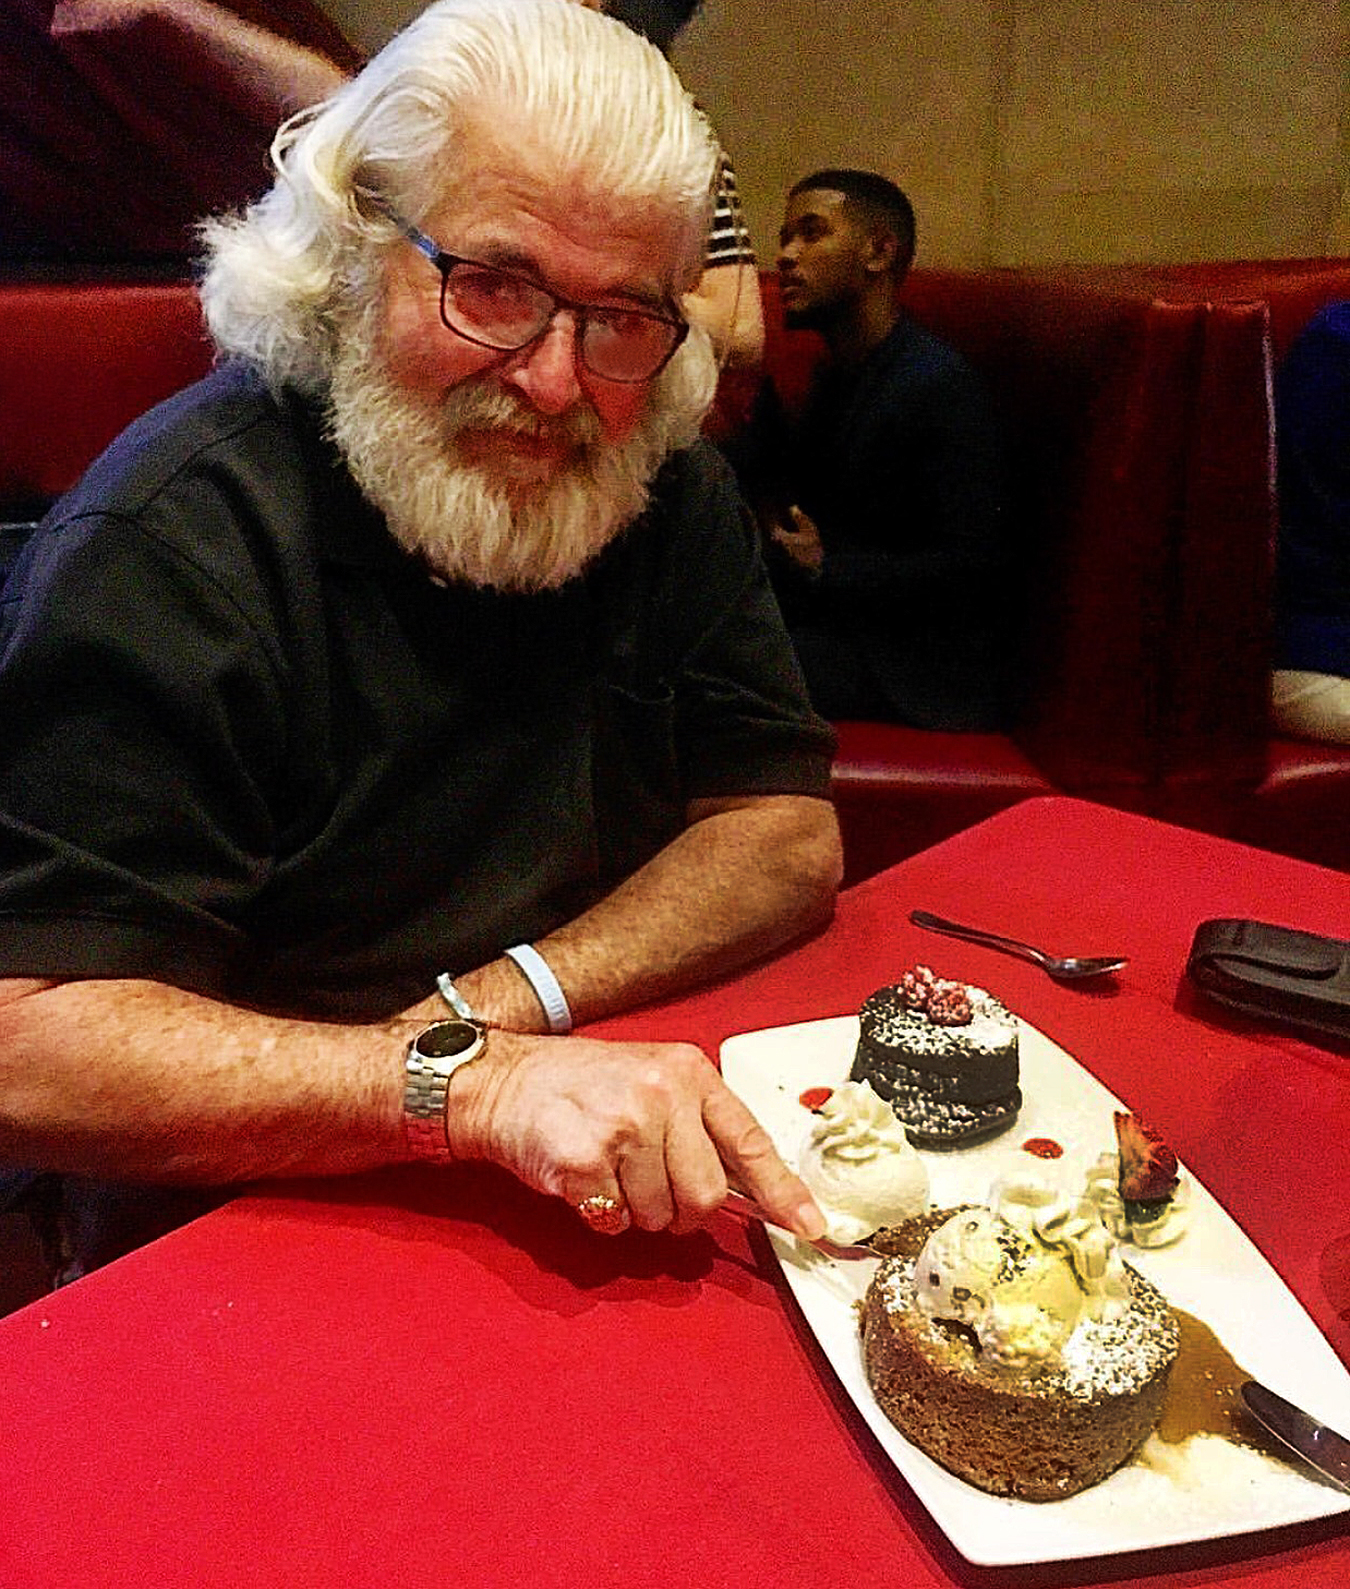 Katie_kerl_mom_hospital_walker_family_love_father_cake_deserts